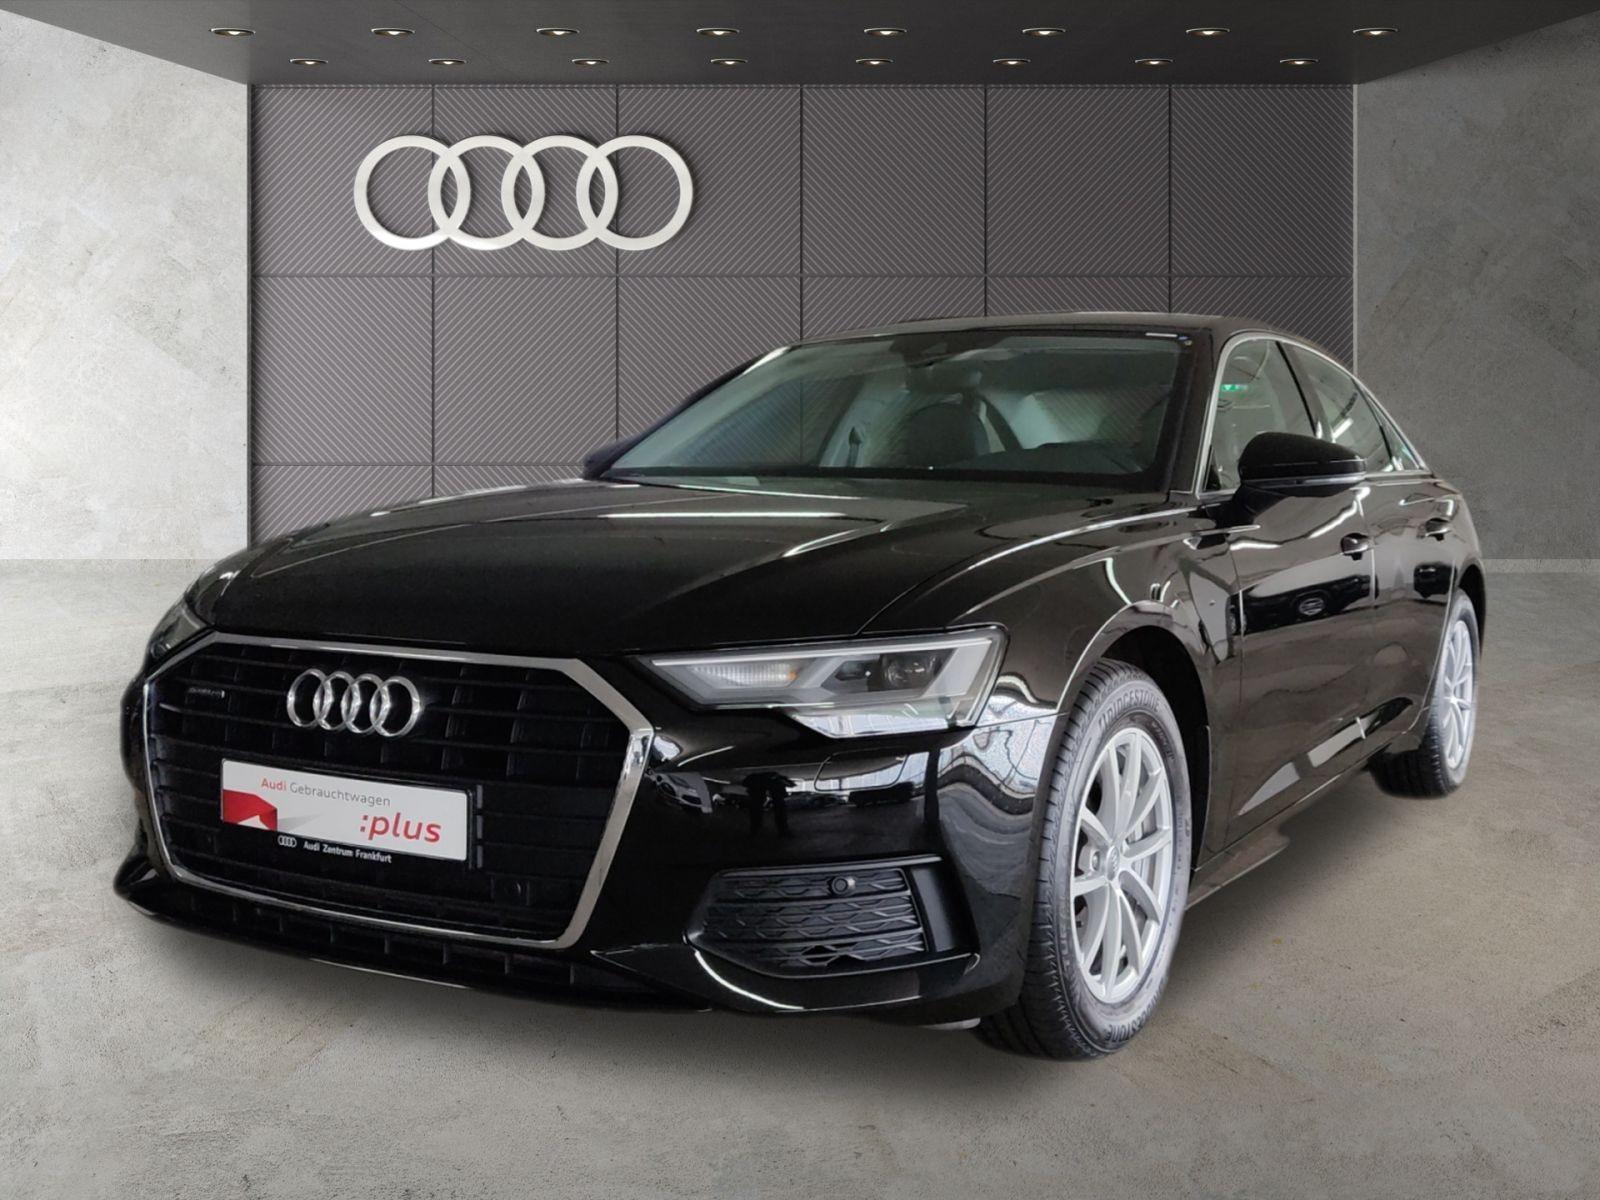 Audi A6 45 TDI quattro tiptronic LED Navi Tempomat, Jahr 2019, Diesel